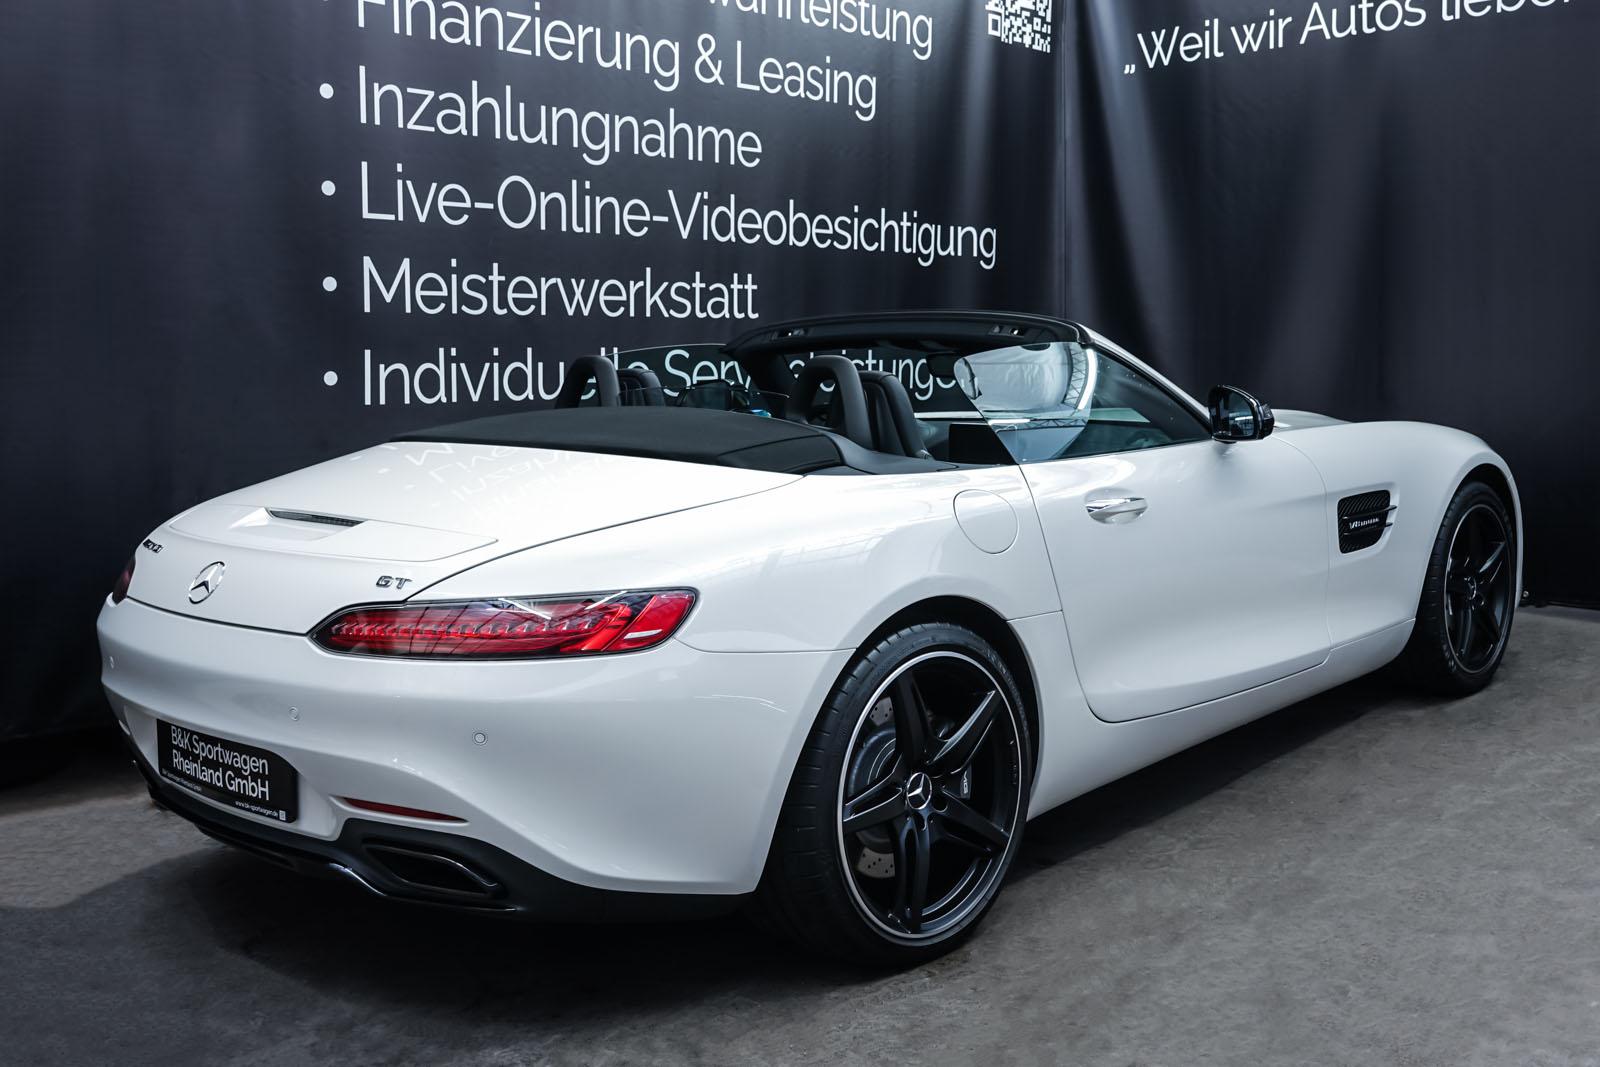 11Mercedes_Benz_AMG_GT_Roadster_Weiss_Schwarz_MB-9710_20_w